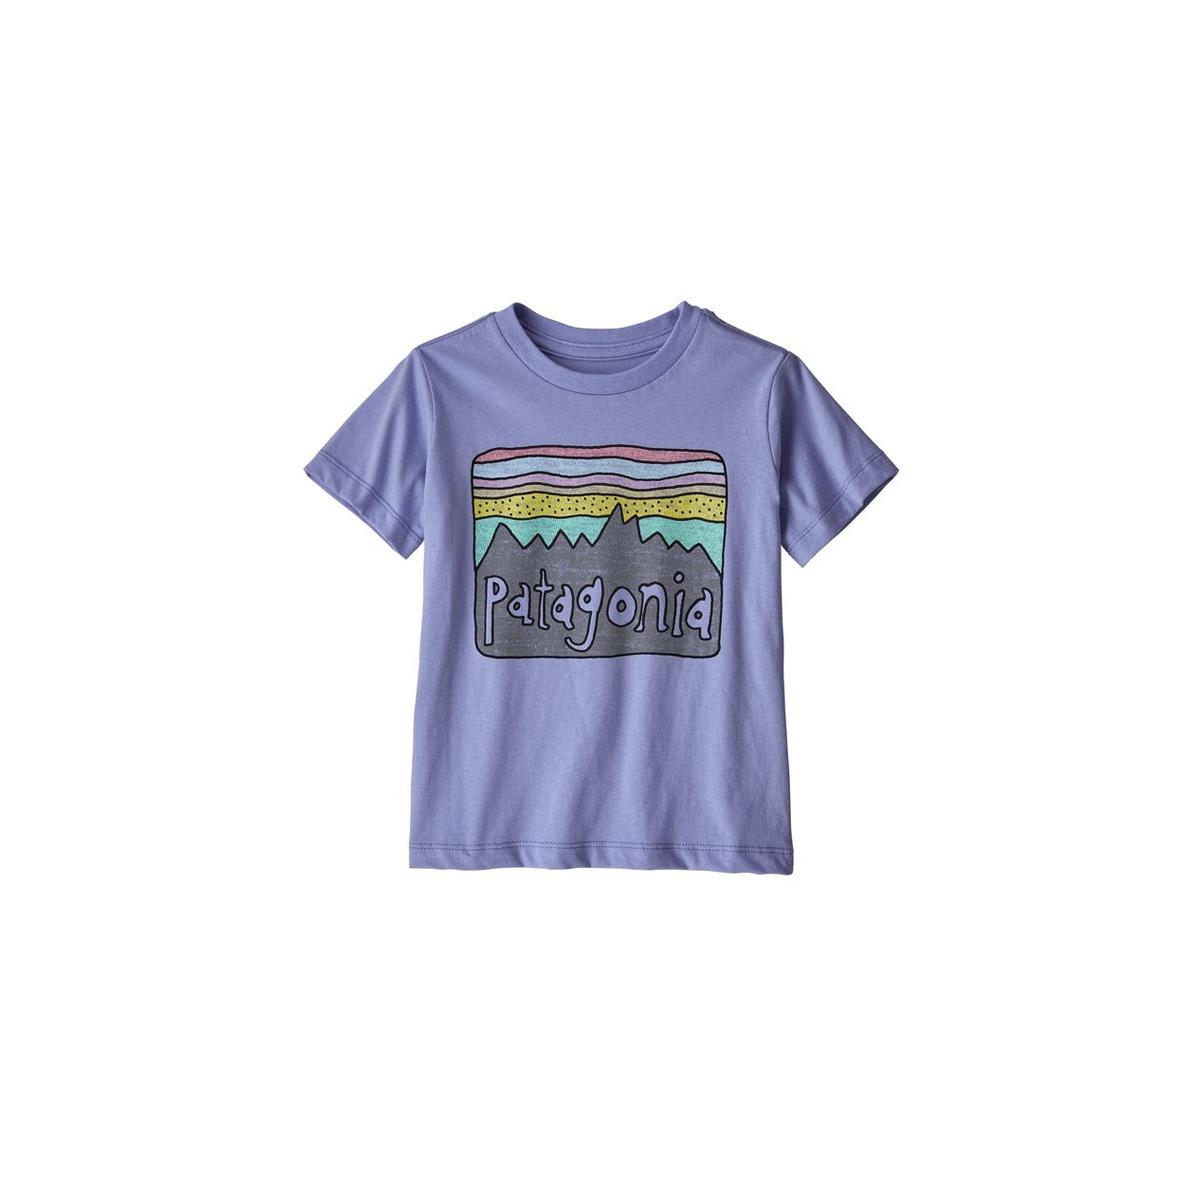 b0eddb4738a Patagonia Baby Fitz Roy Skies Organic T-Shirt - Gearhead Outfitters